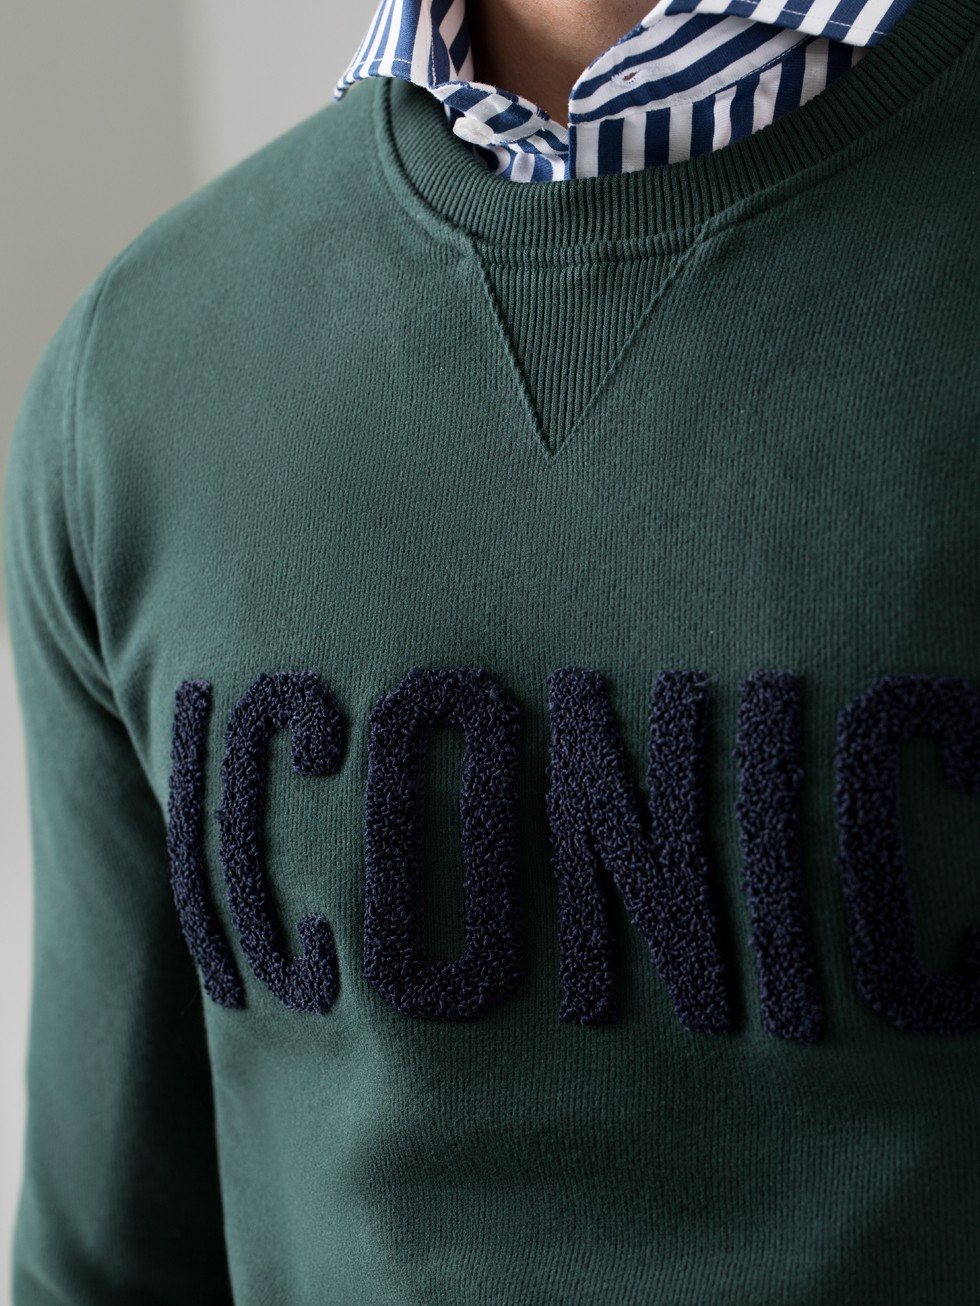 Sudadera ICONIC verde